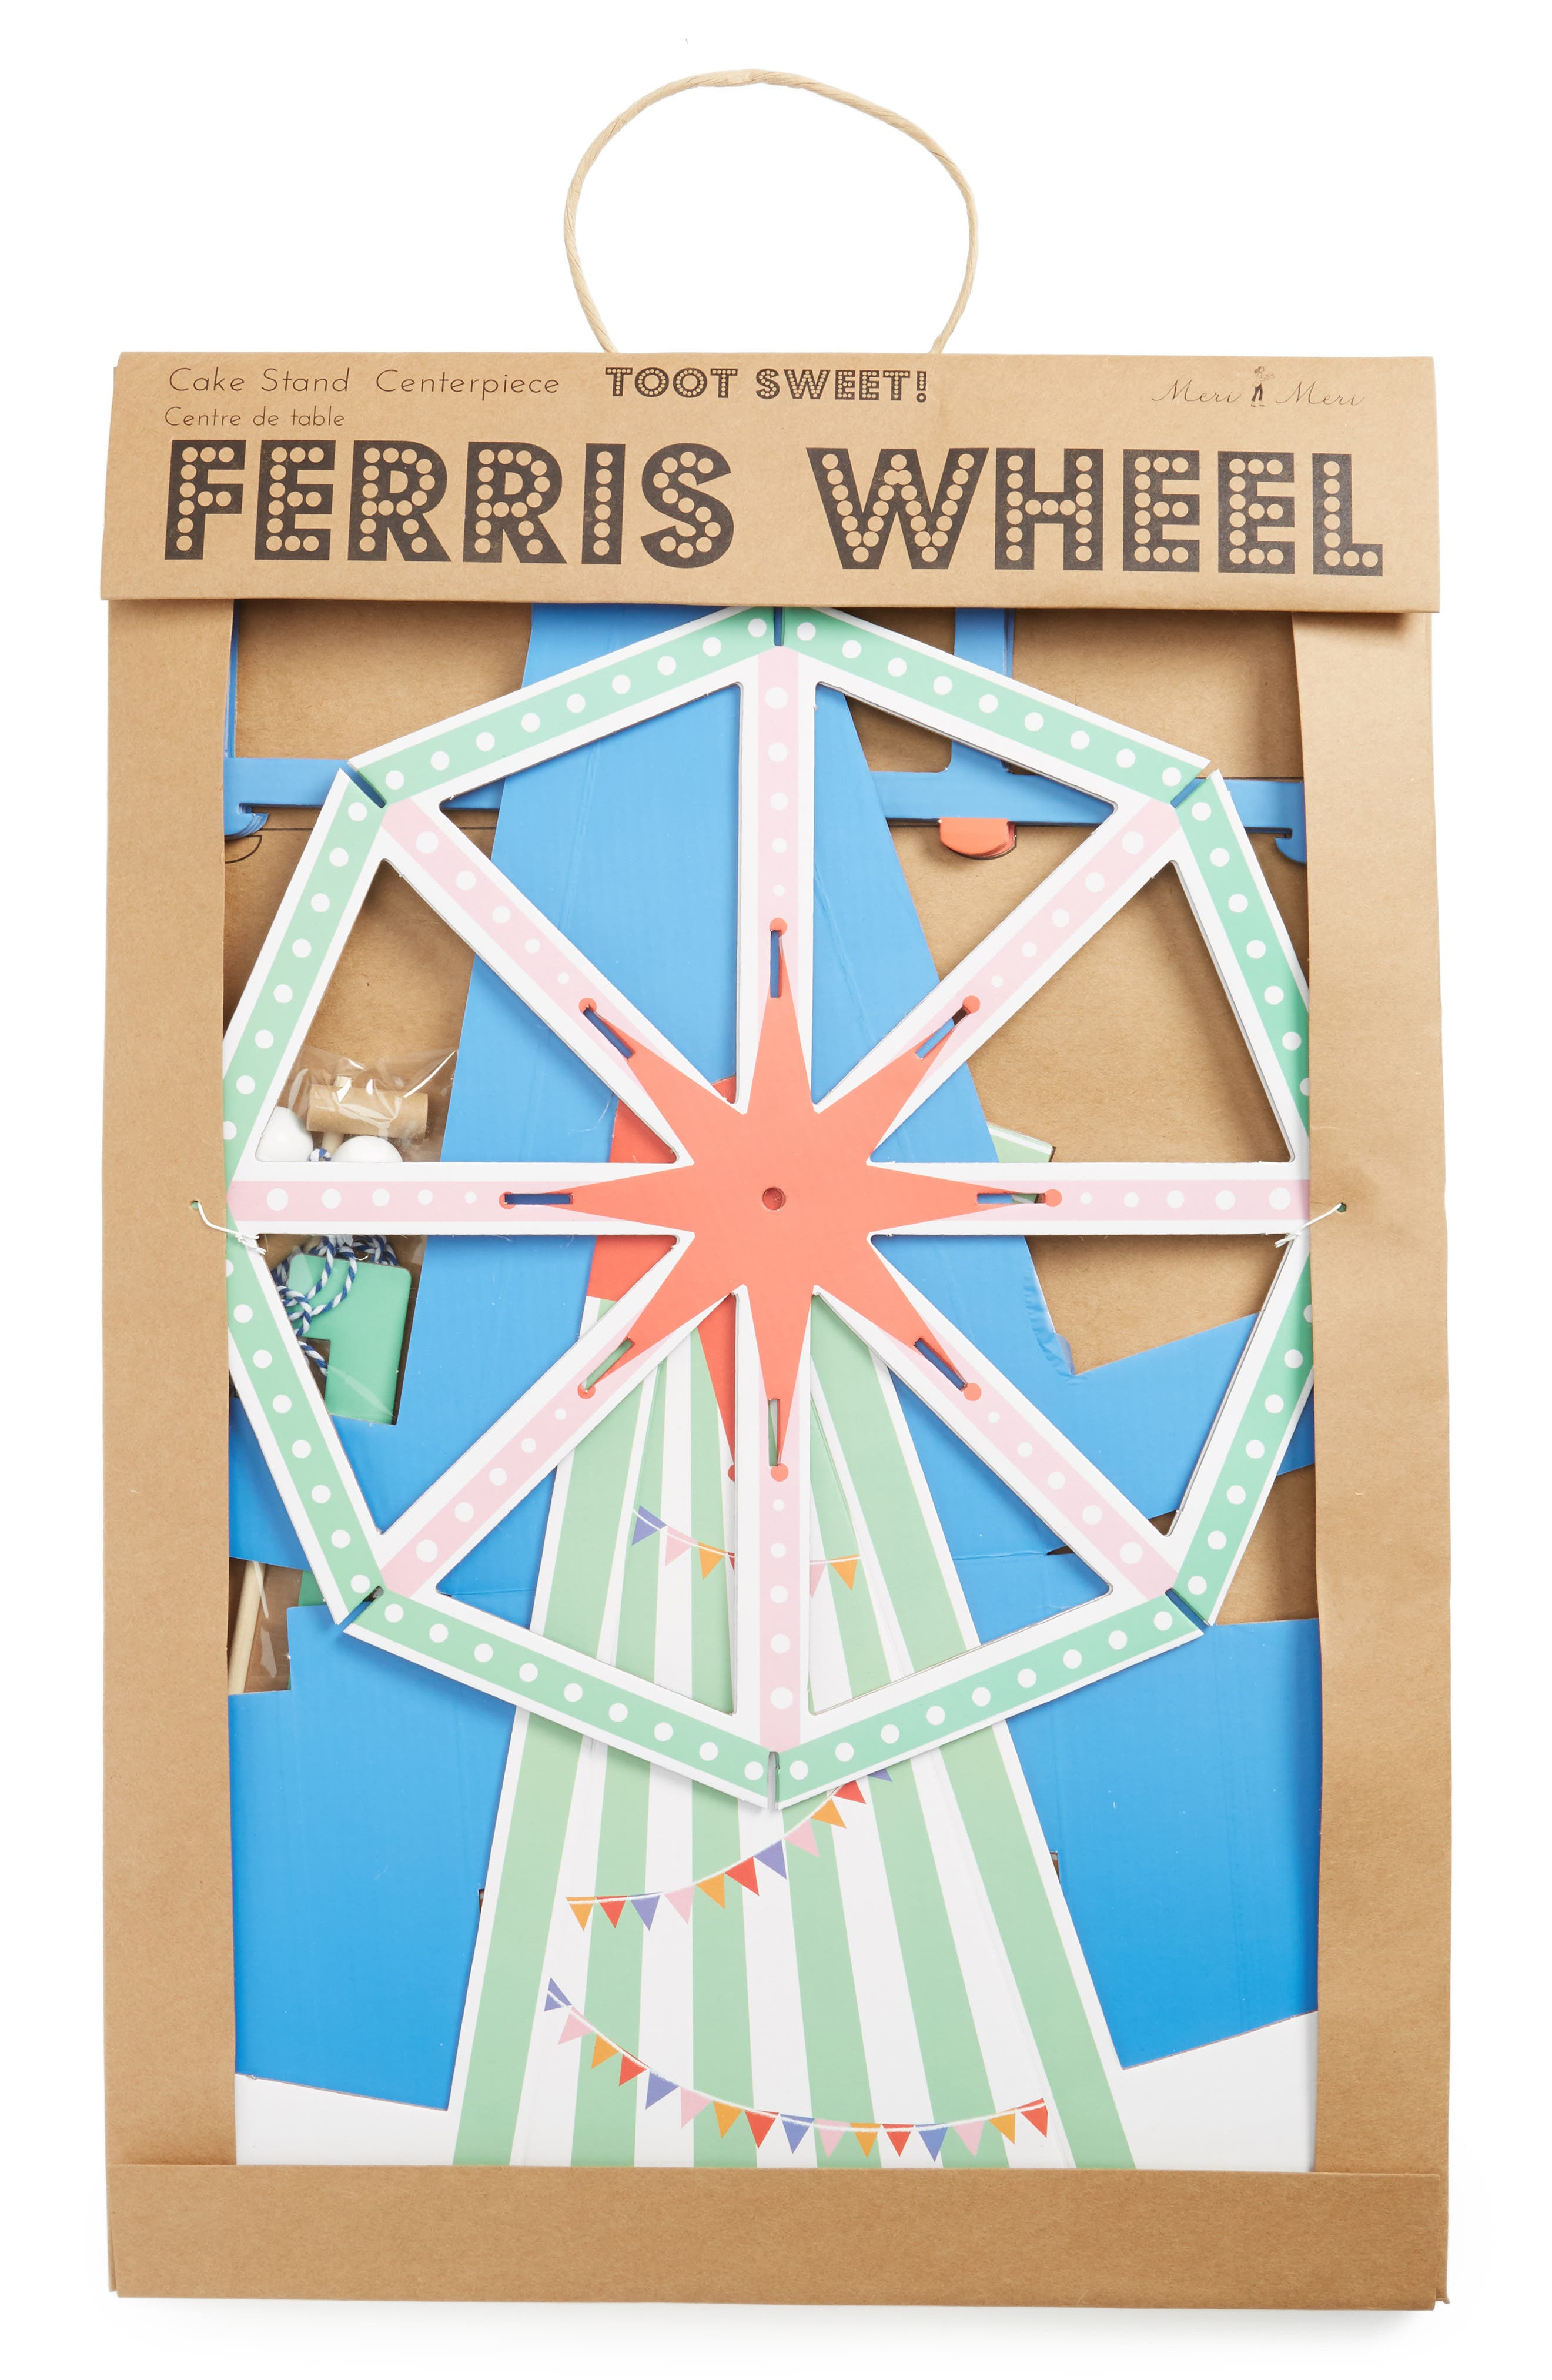 Meri Meri Toot Sweet - Ferris Wheel Cupcake Centerpiece